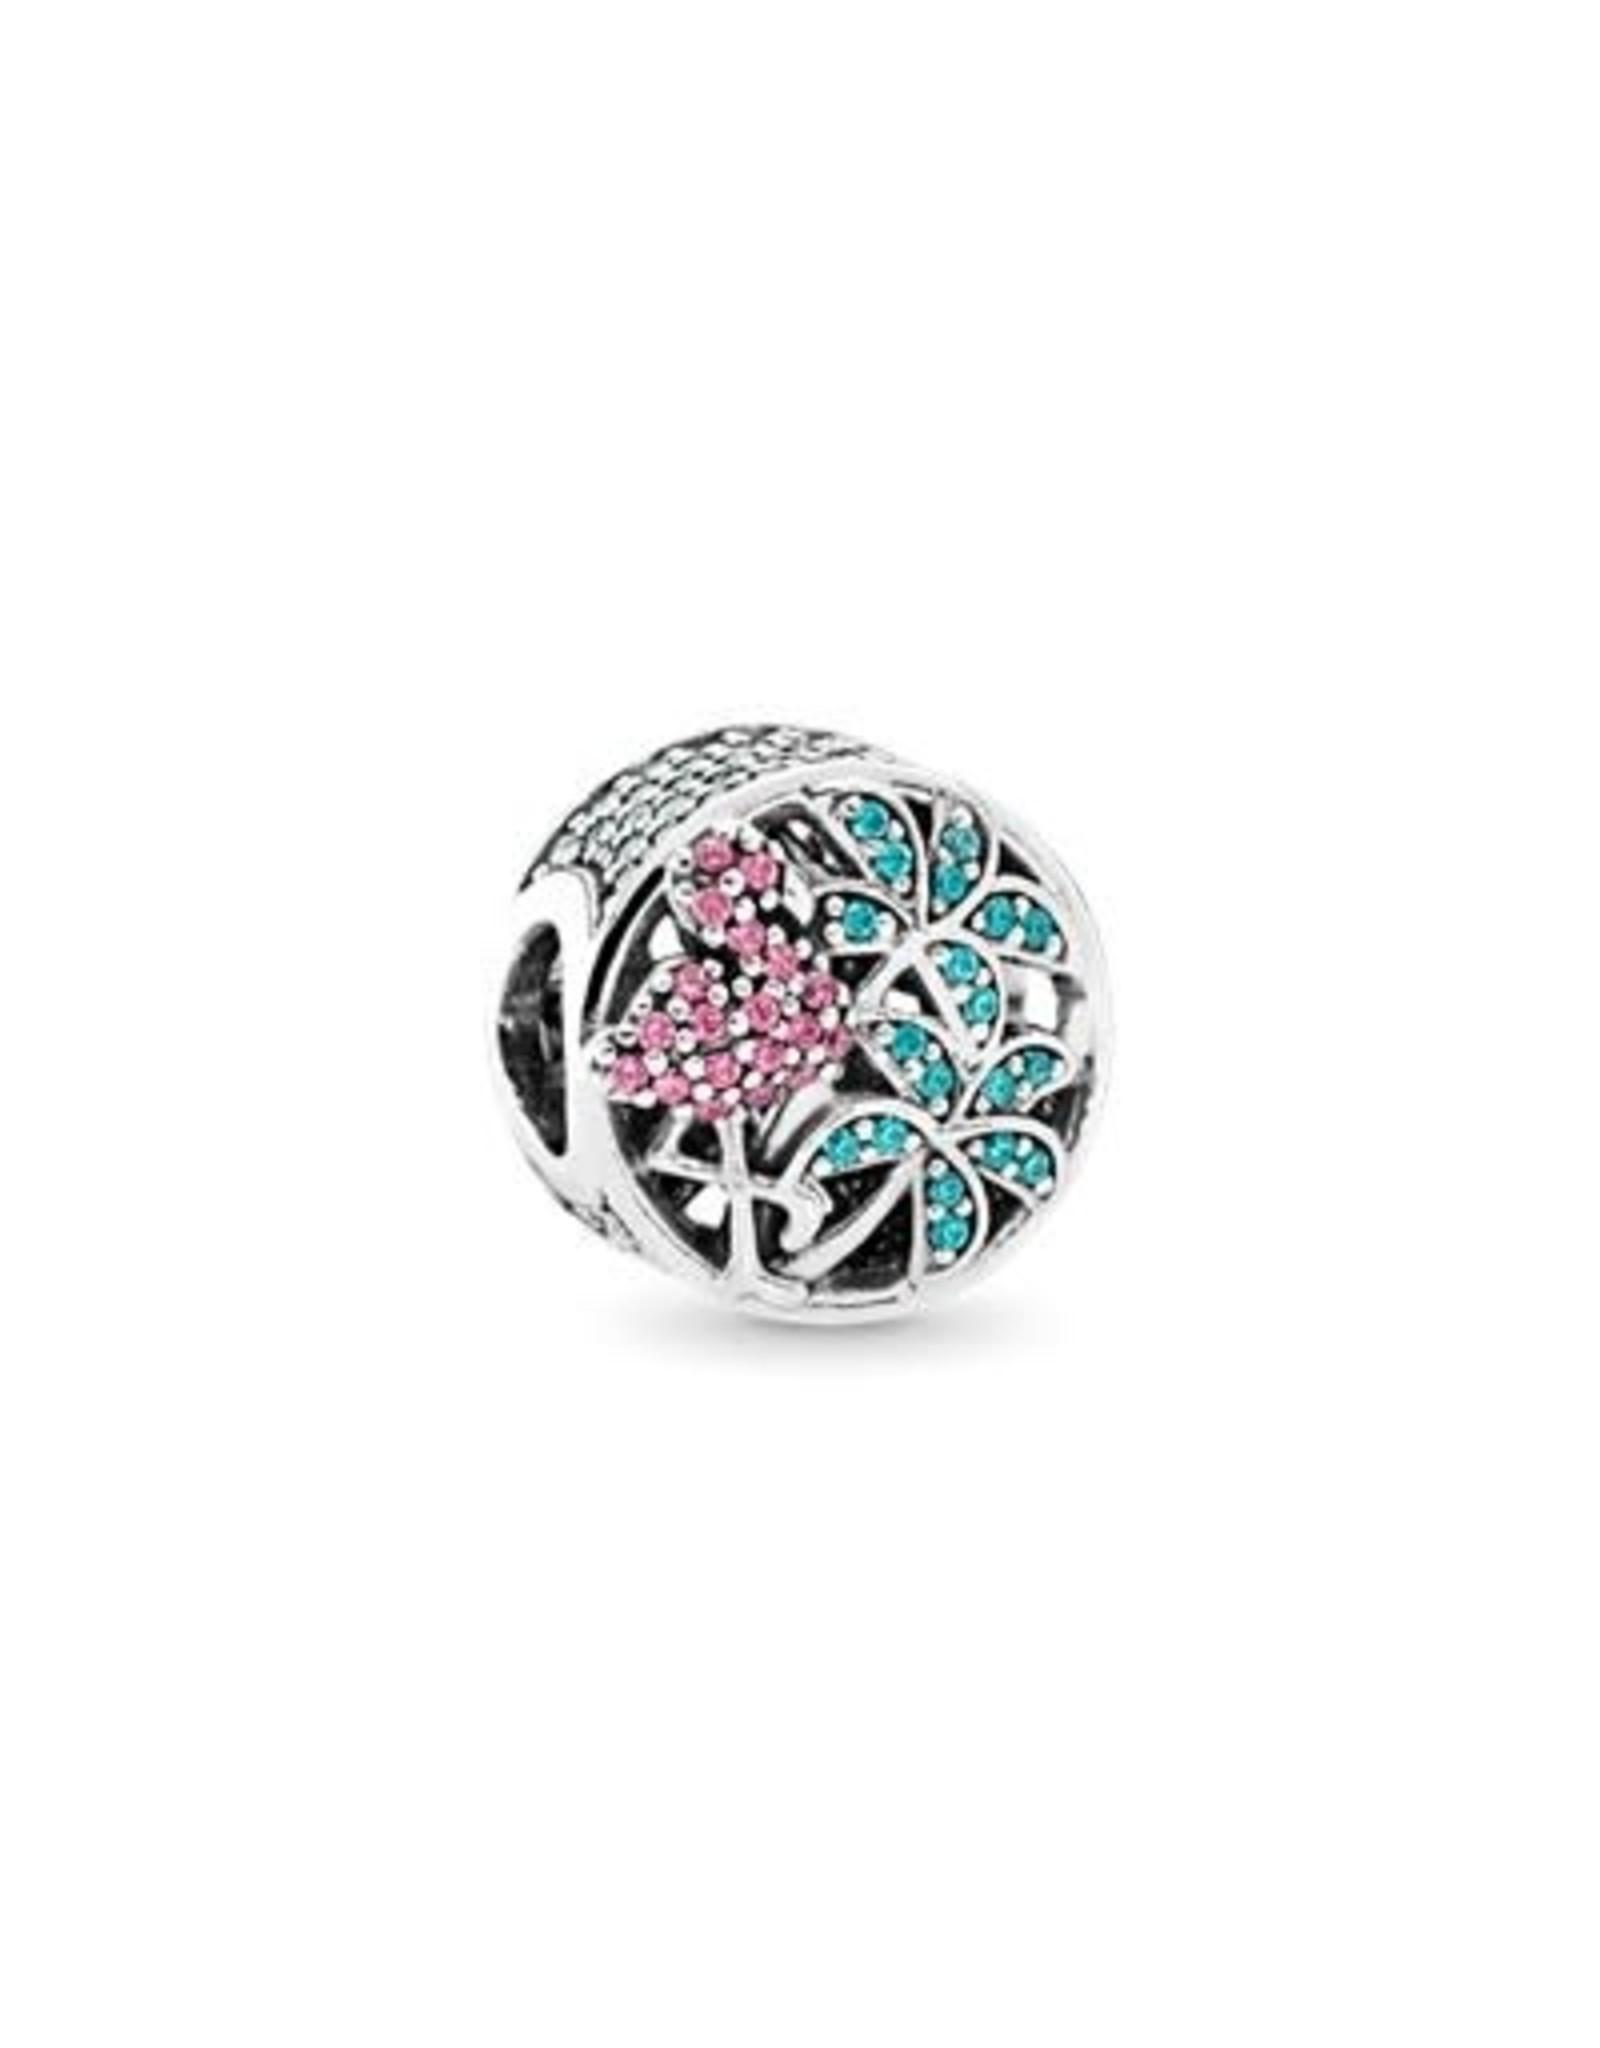 Pandora Pandora Charm, Tropical Flamingo, Light Green Crystals & Multi-Coloured CZ